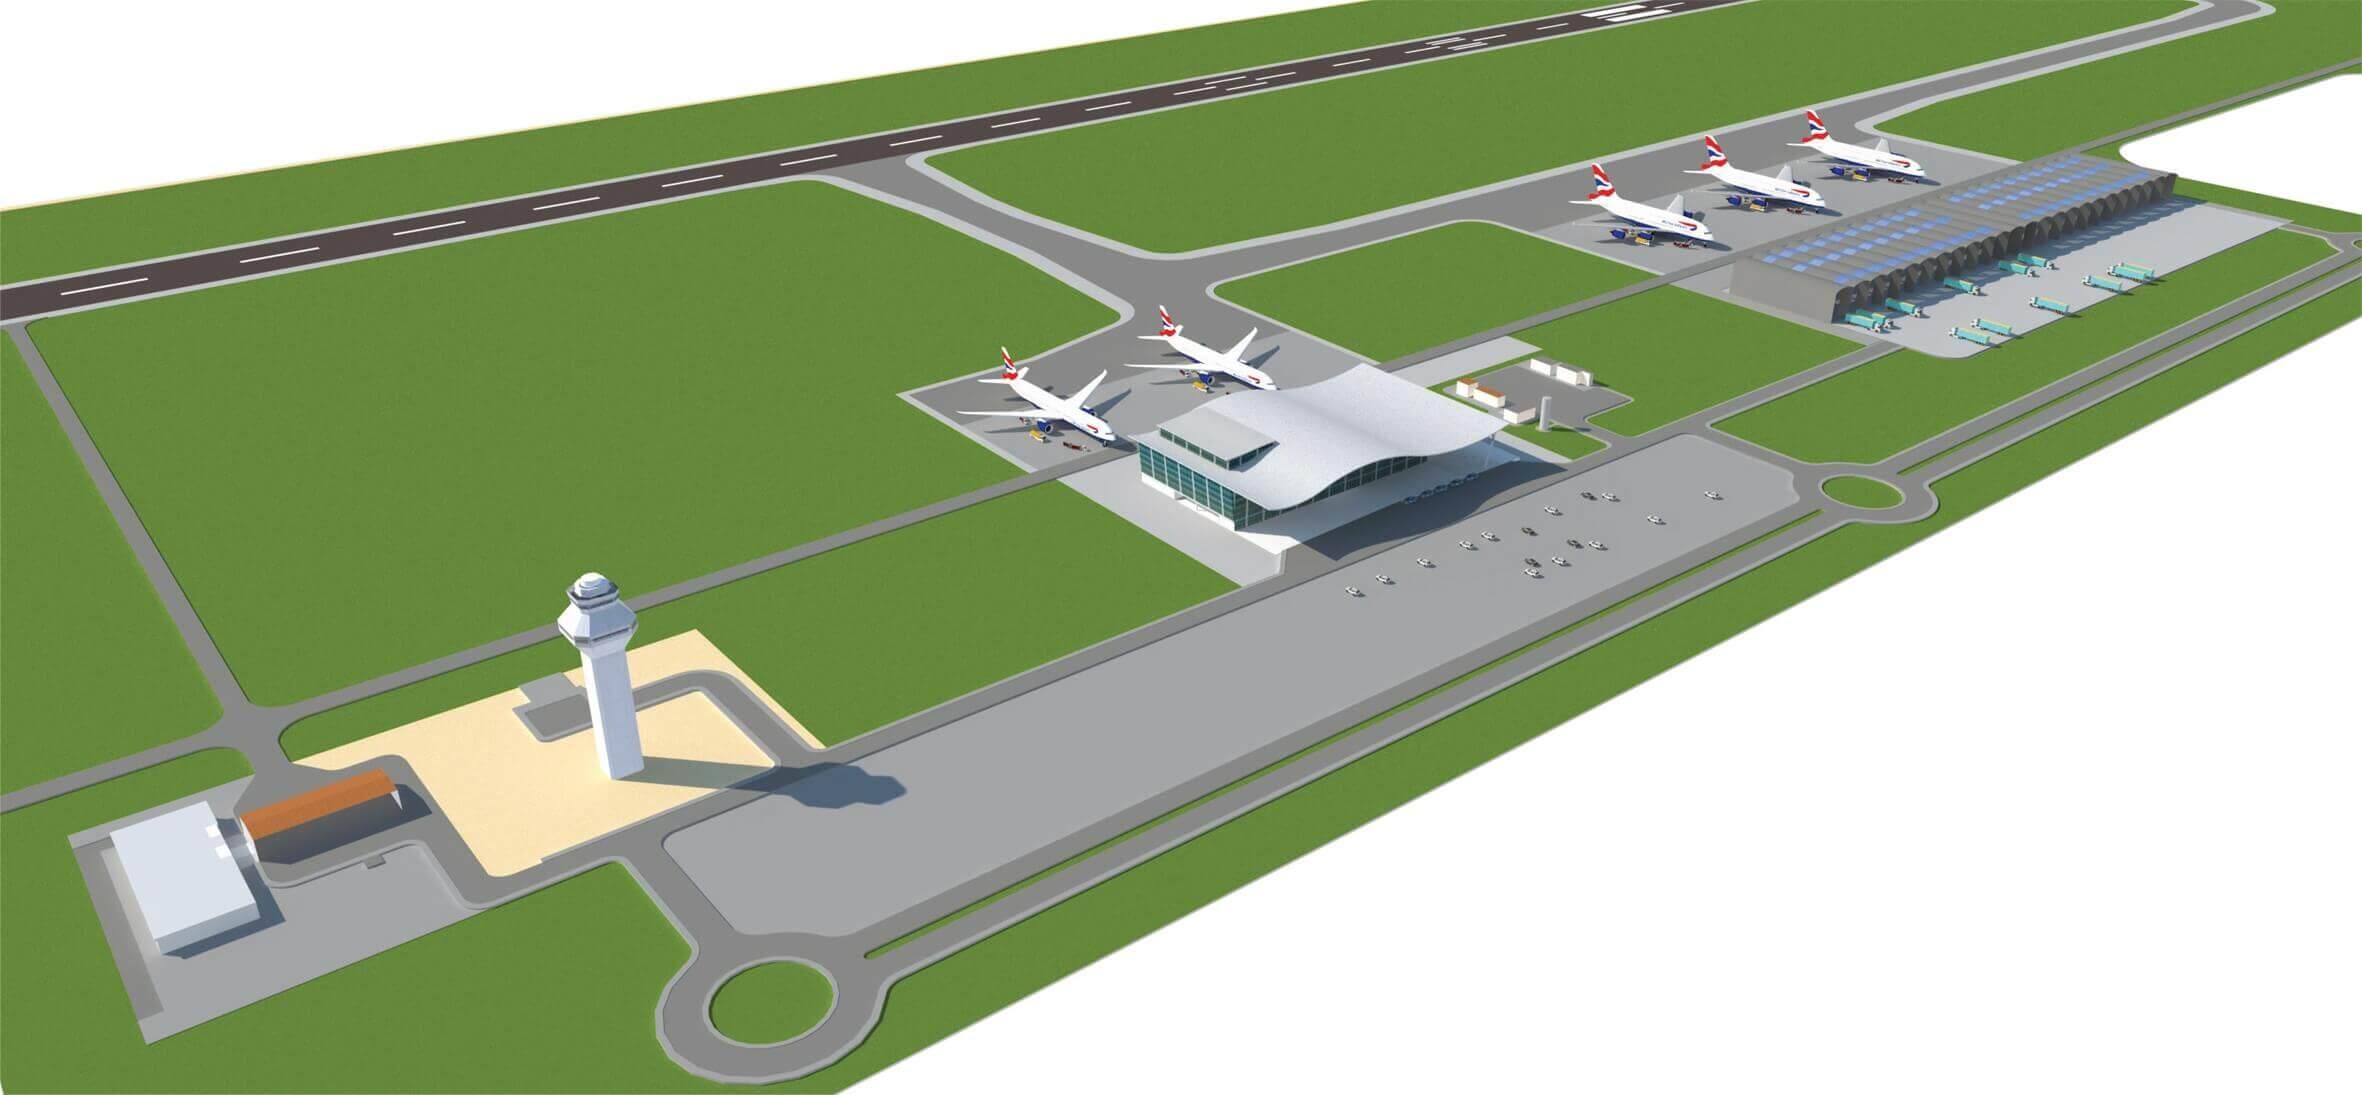 Projeto do Aeroporto de Pouso Alegre